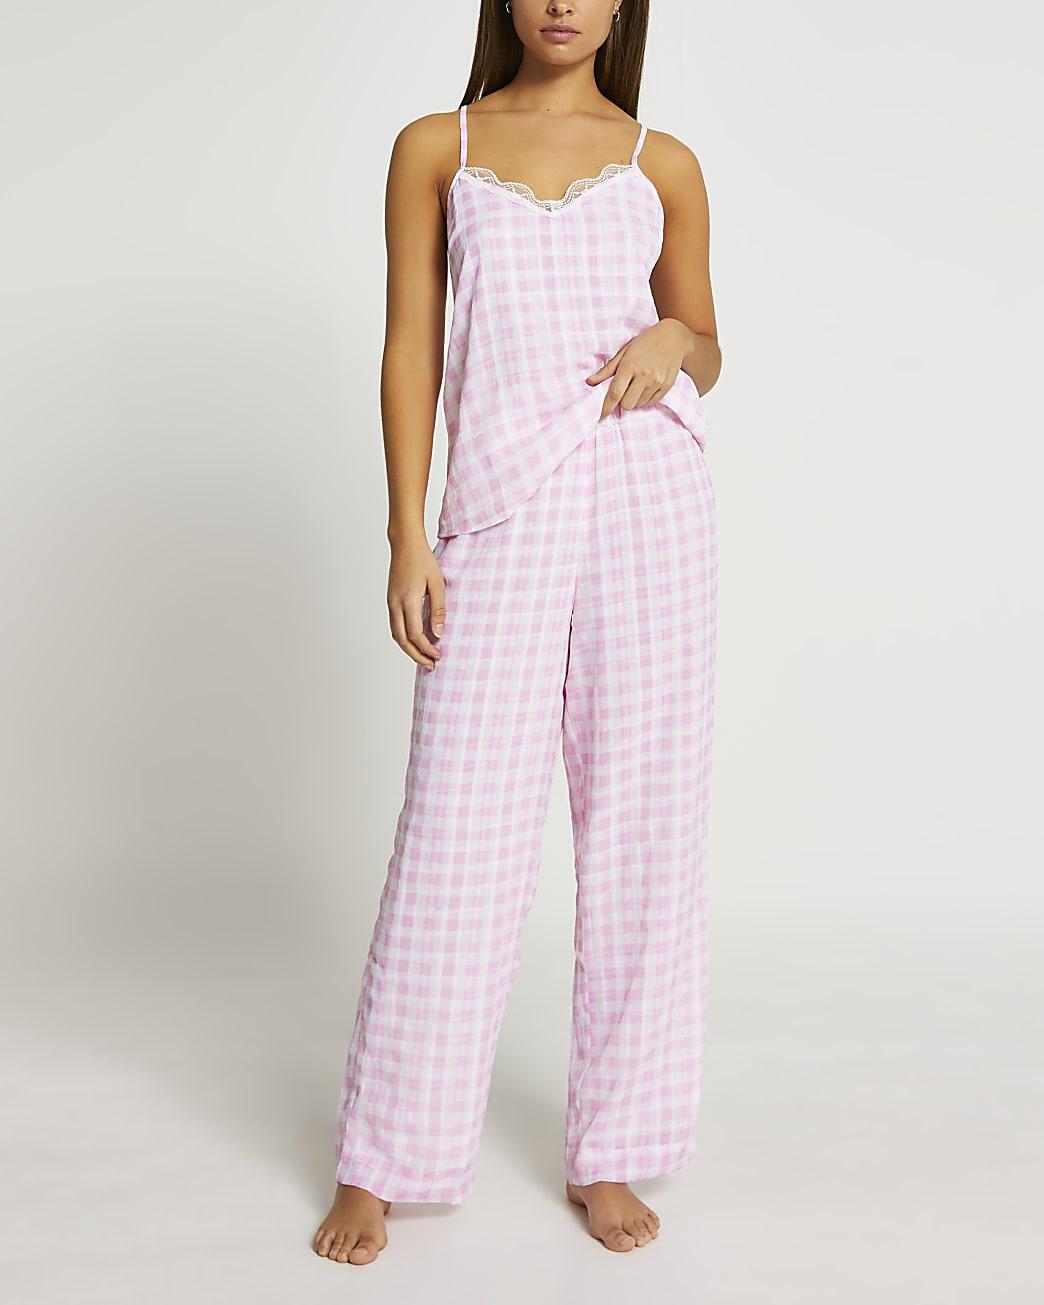 Pink gingham pyjama cami set